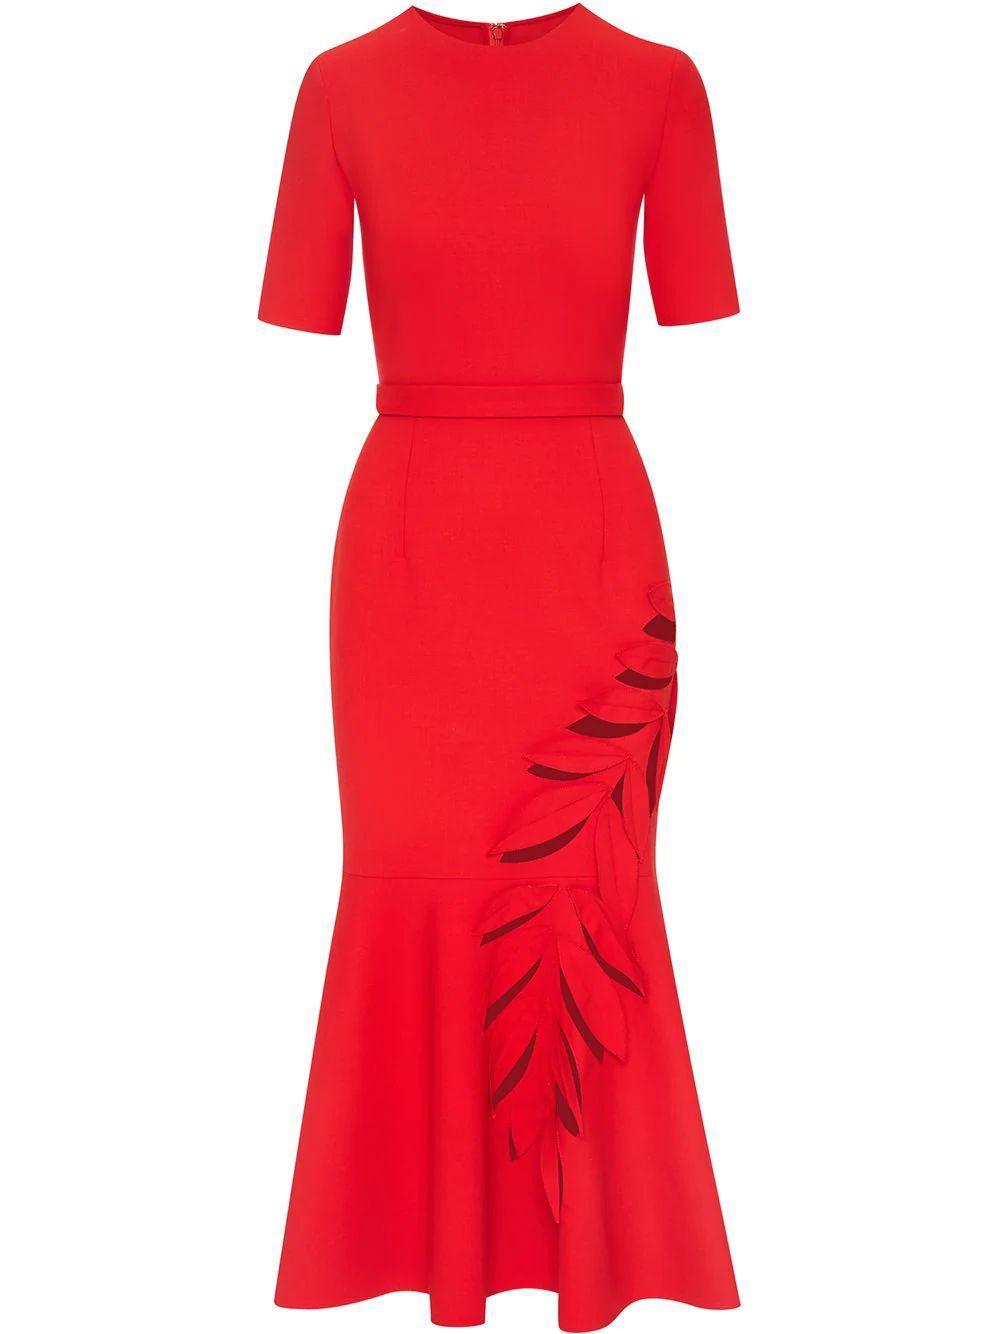 Cut- Out Detail Midi Dress Item # 21RN618DSW